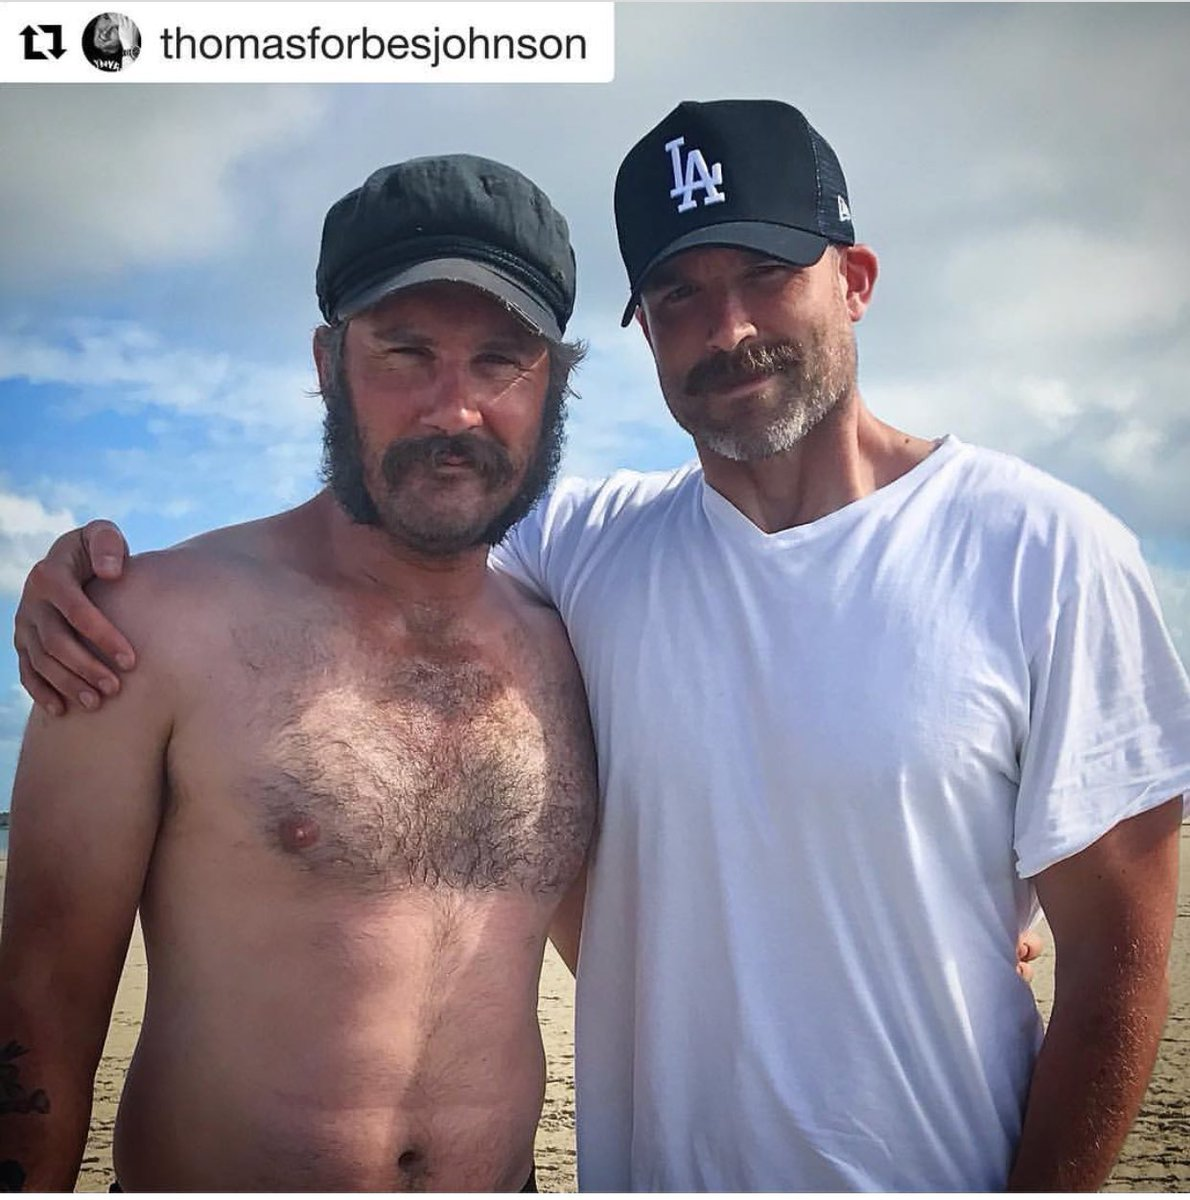 Thank you Thomas on IG for sharing this pic! ~L #InLikeFlynn  #Charlie  https:// instagram.com/p/BUlI4L4AwxH/  &nbsp;  <br>http://pic.twitter.com/I4uqgMtxJ7